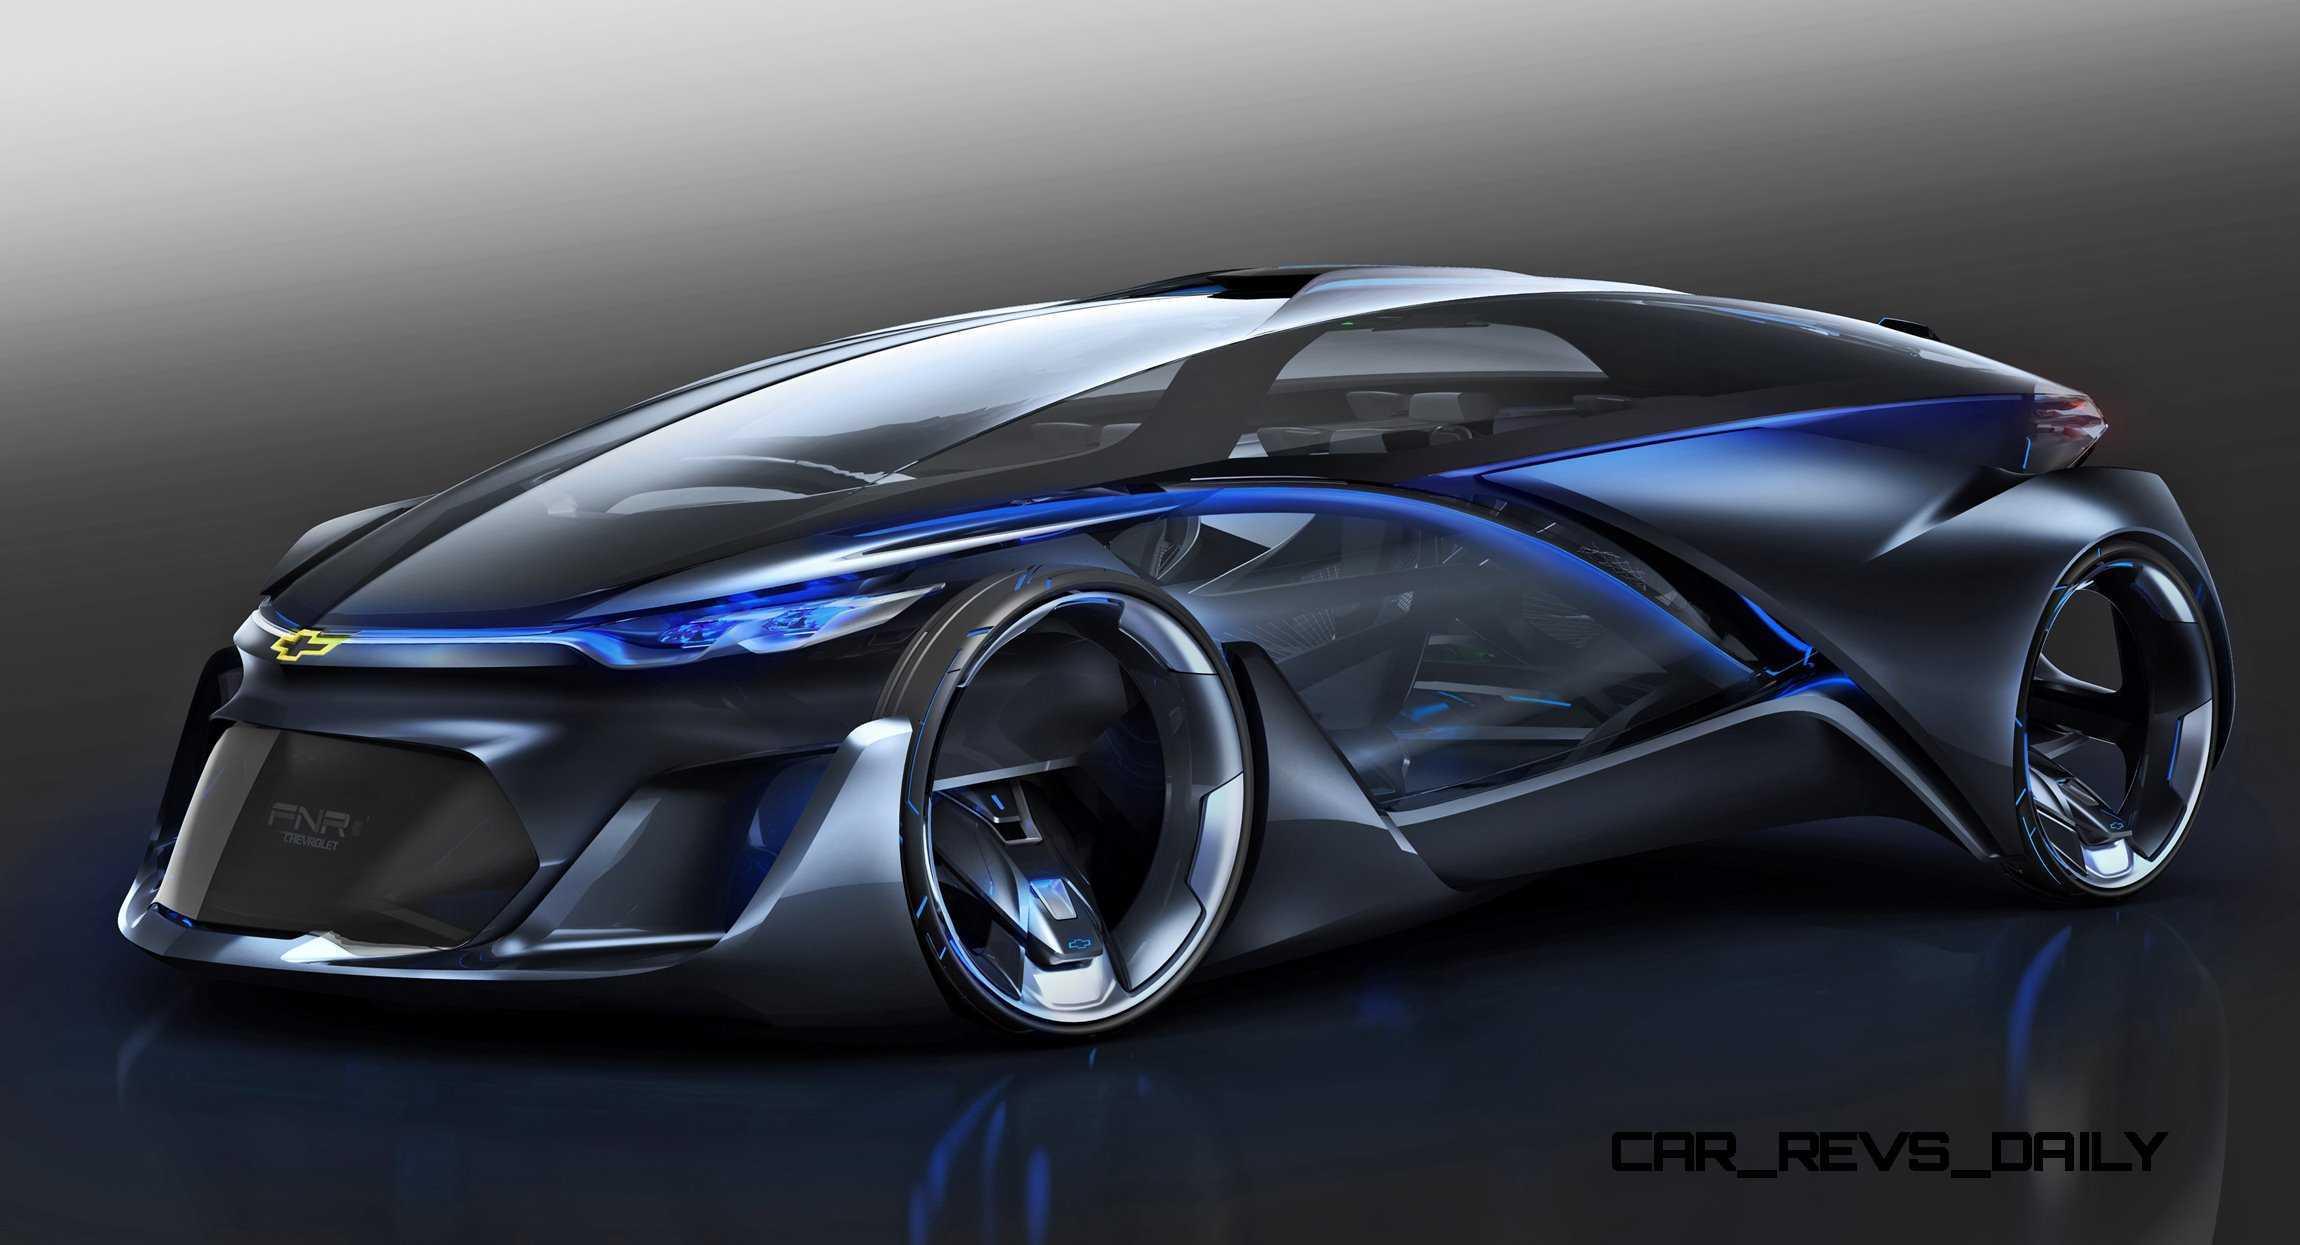 Chevy Concept Cars 2015 2015 Chevrolet FNR Con...